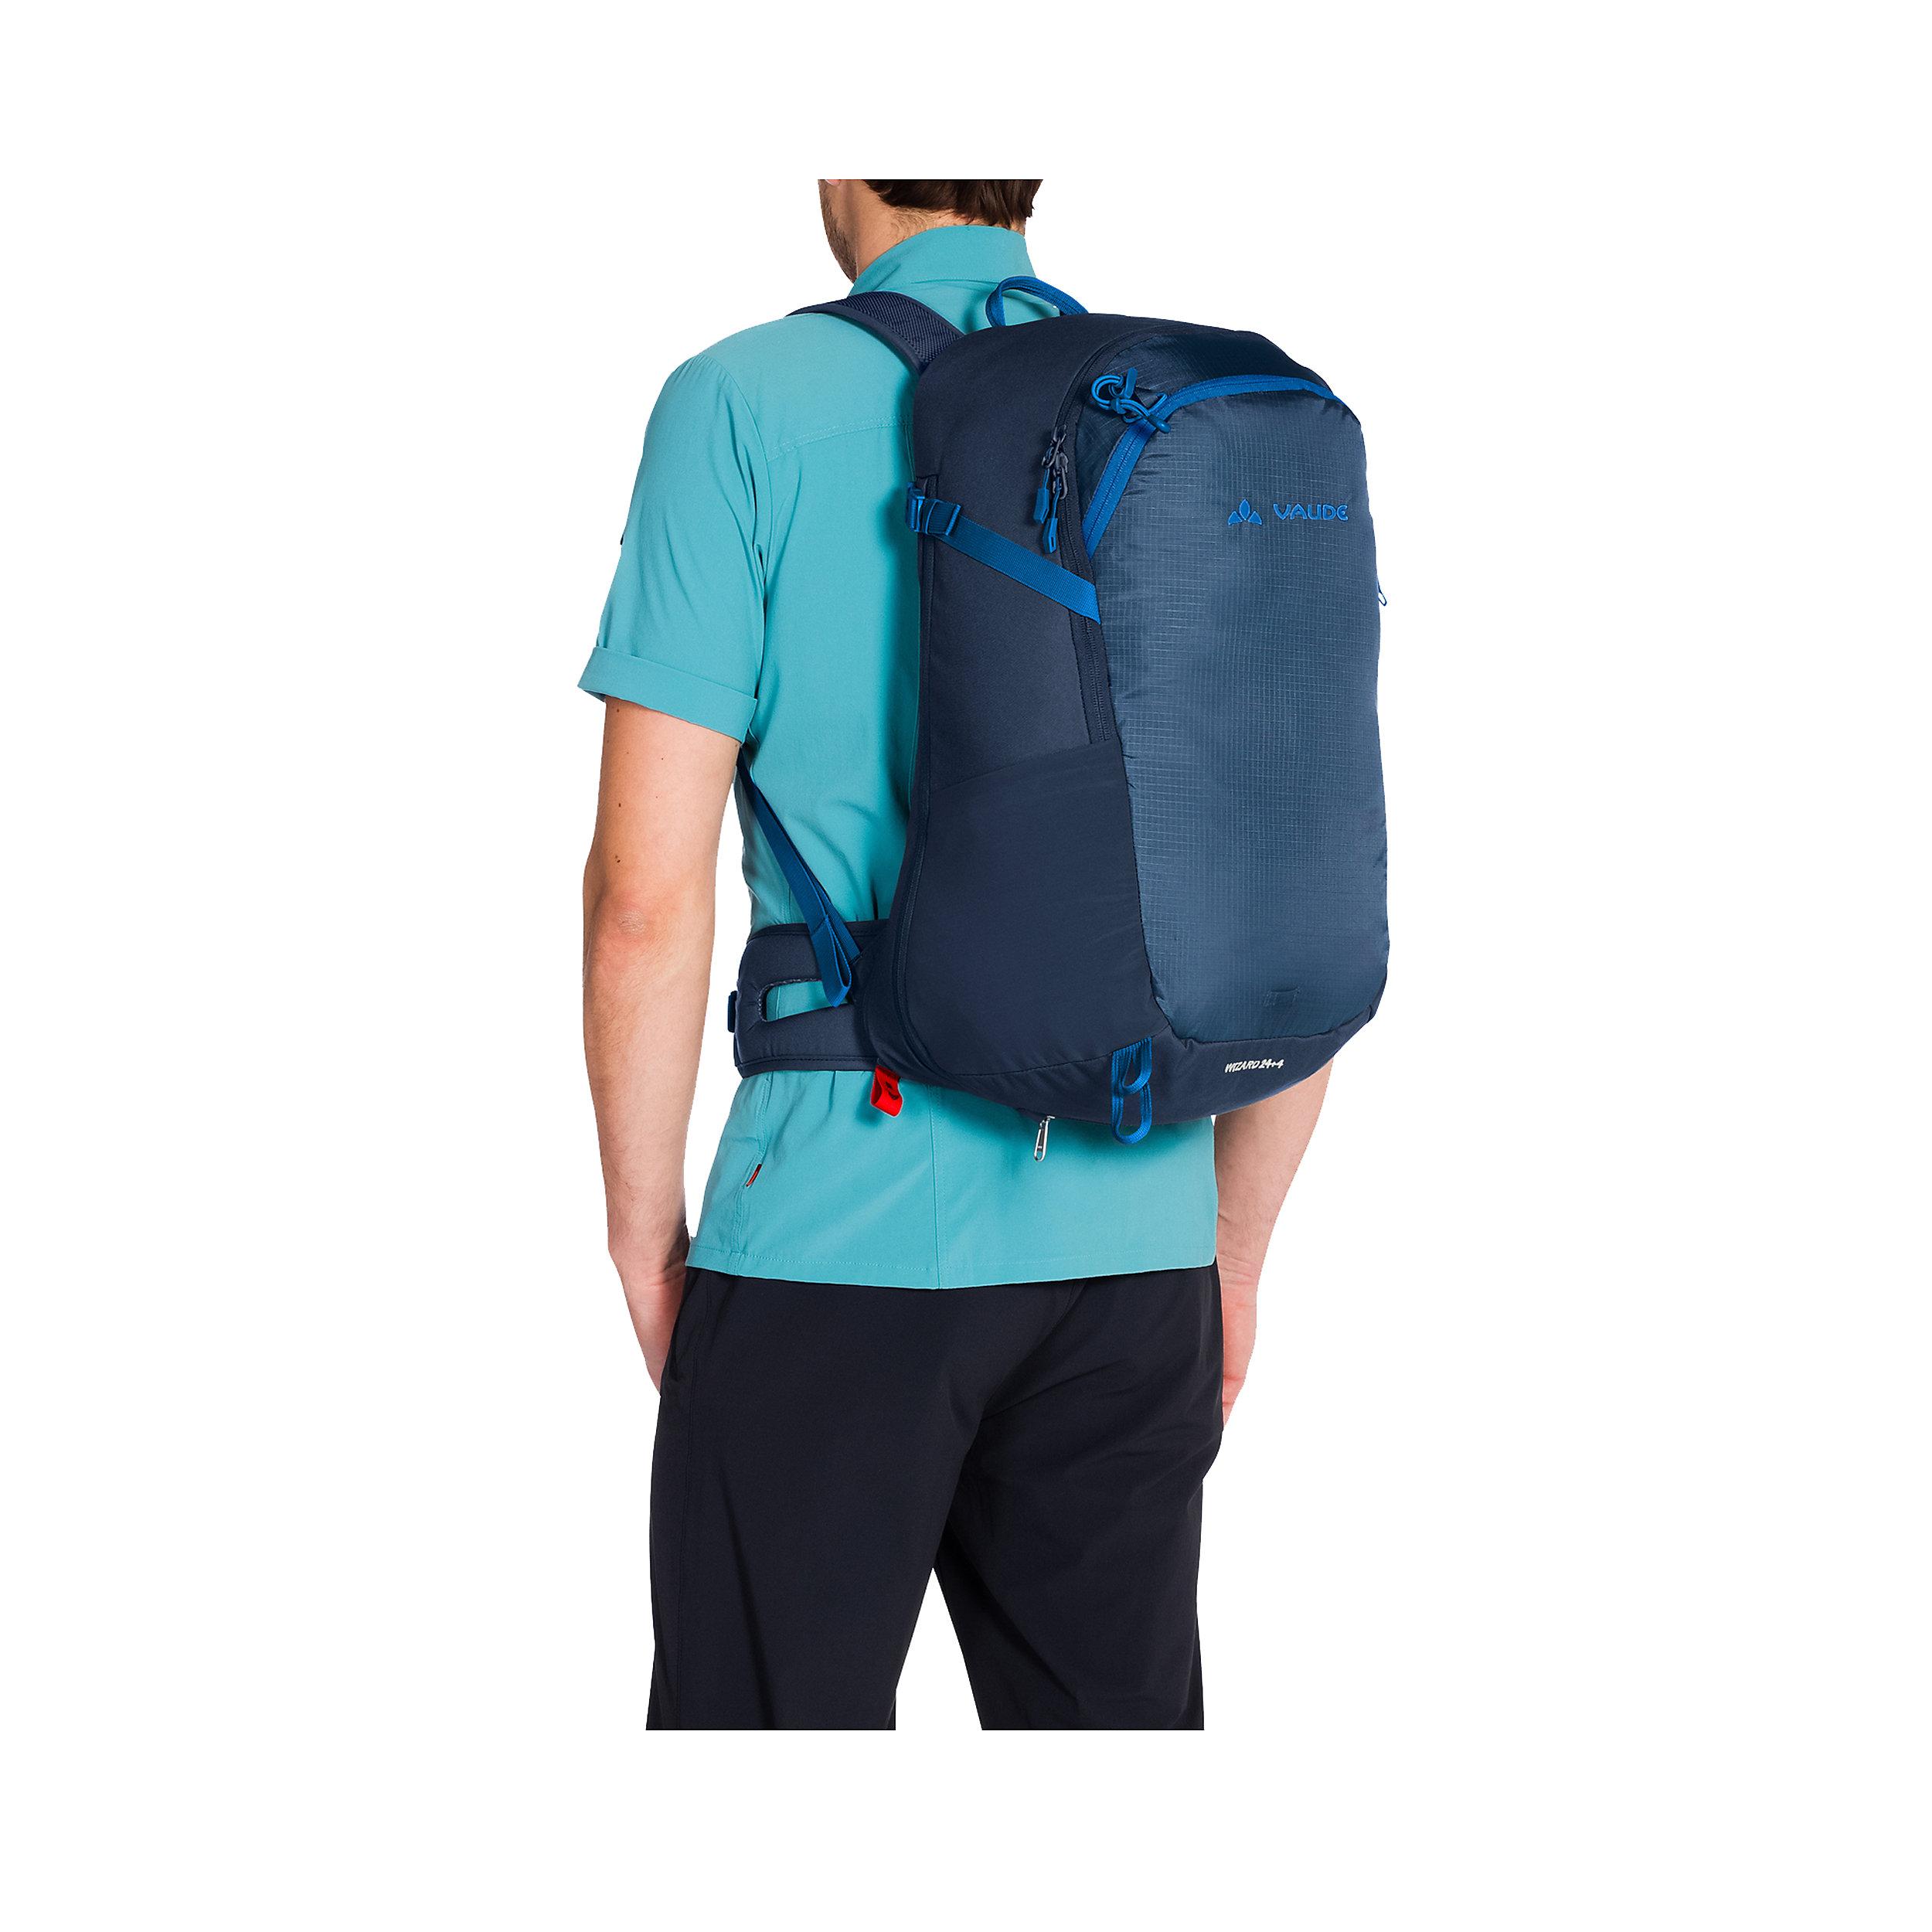 Wanderrucksack Wizard 24+4 Backpacks